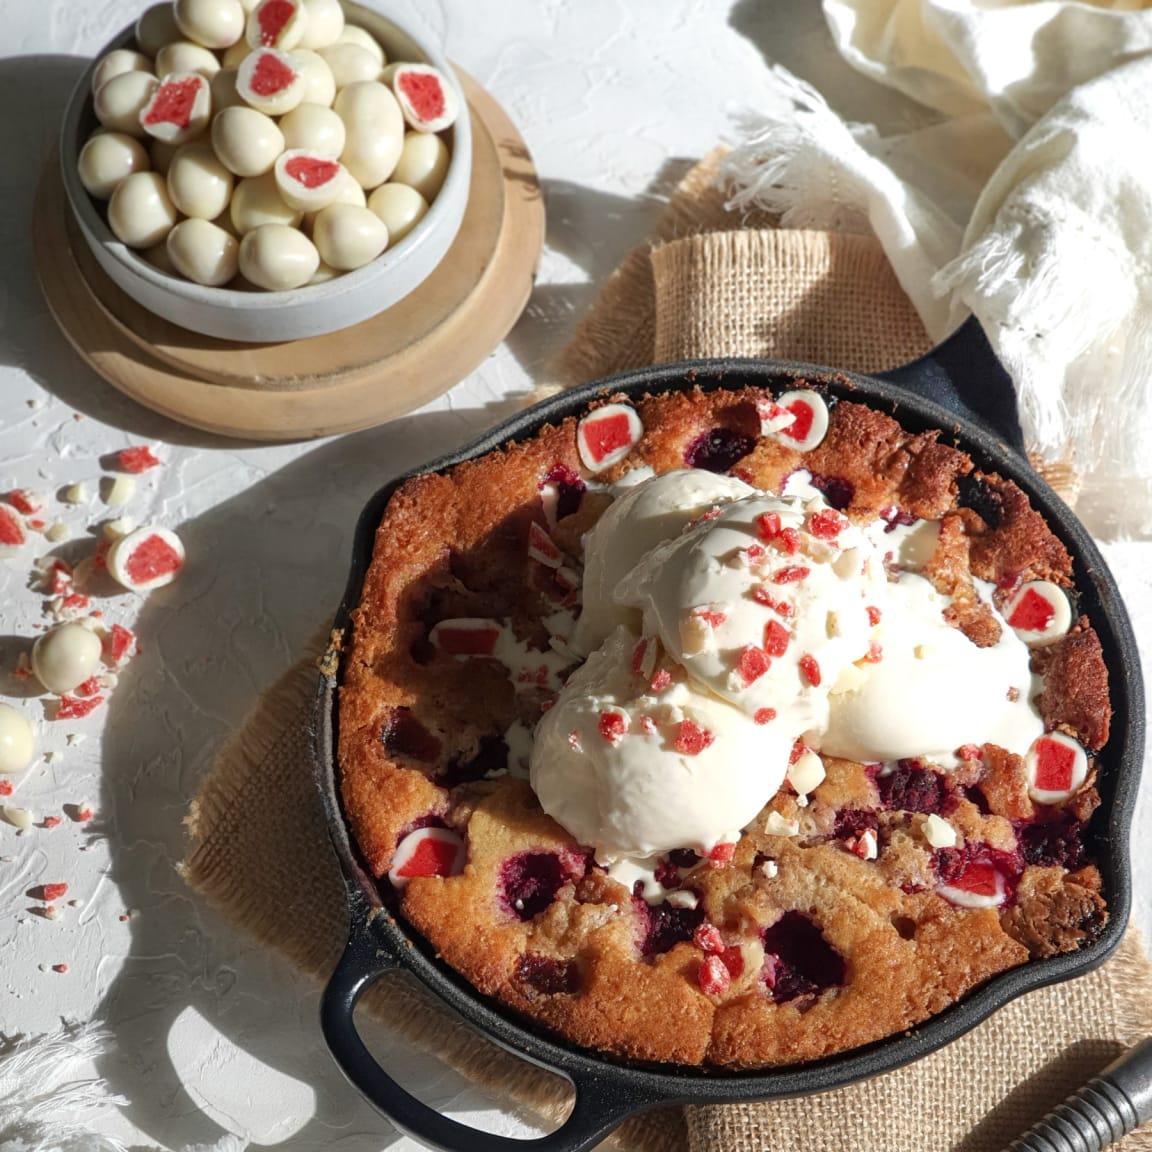 Recipe: White Choc Raspberry FruChoc cobbler